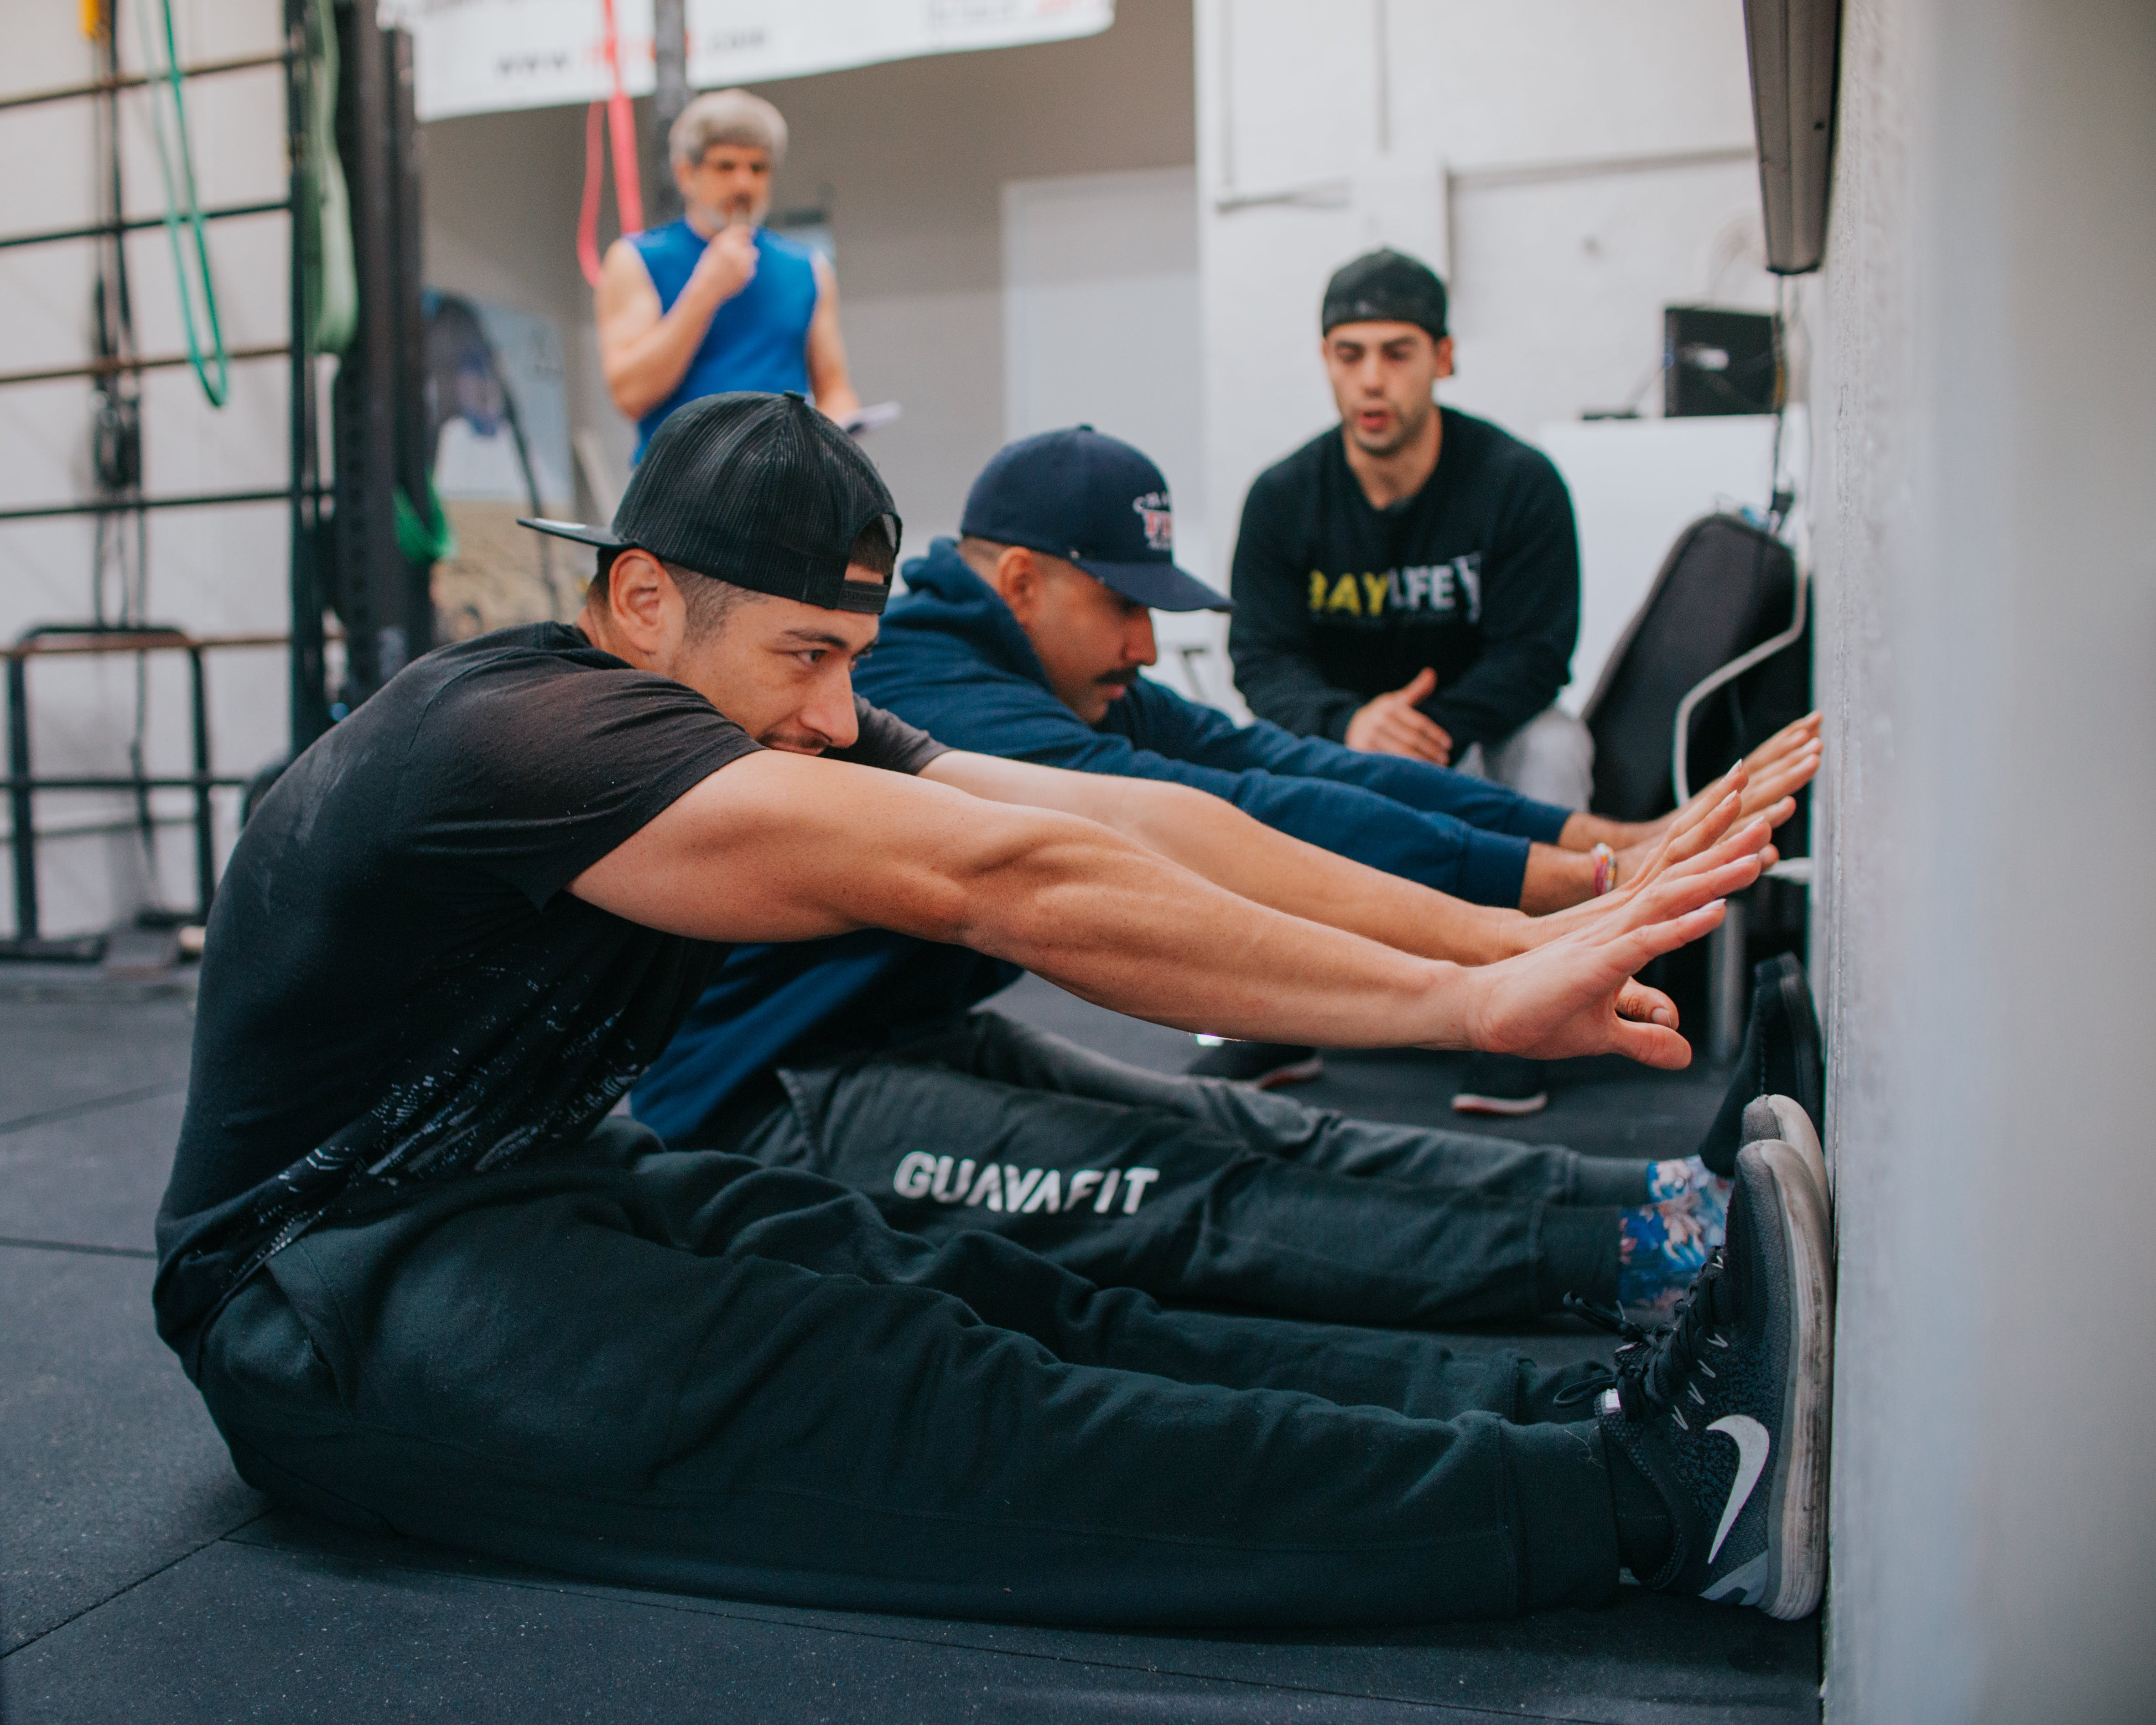 Two Men Doing Exercise